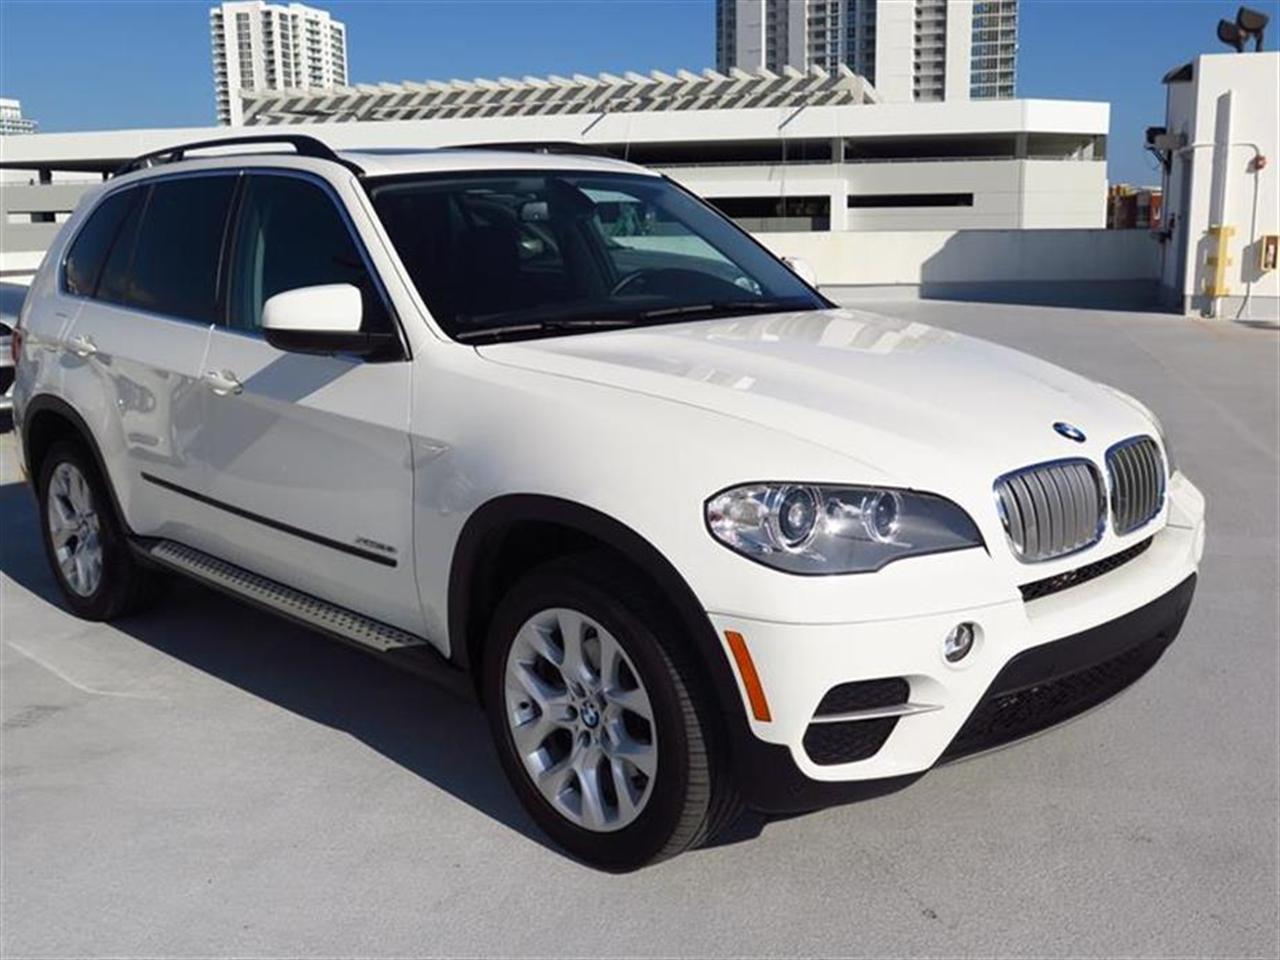 2013 BMW X5 AWD 4dr xDrive35i 19018 miles 10-way power-adjustable drivers and passengers seat -inc